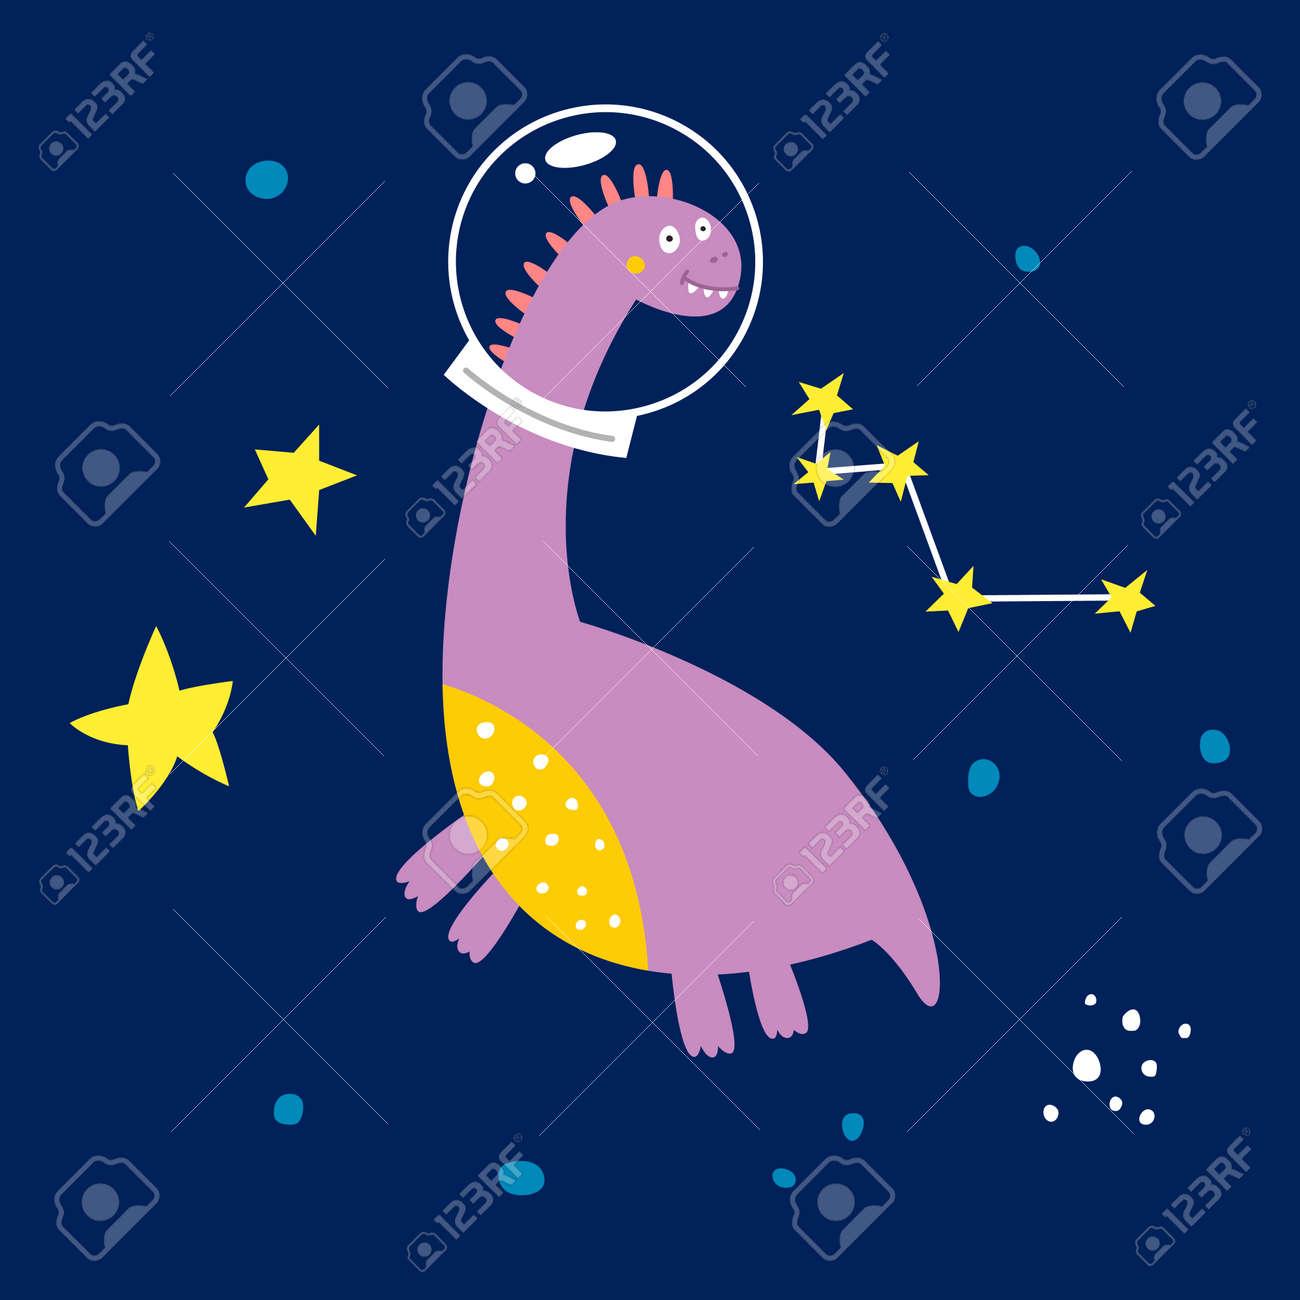 Space dinosaur, vector illustration for children fashion. - 169772082